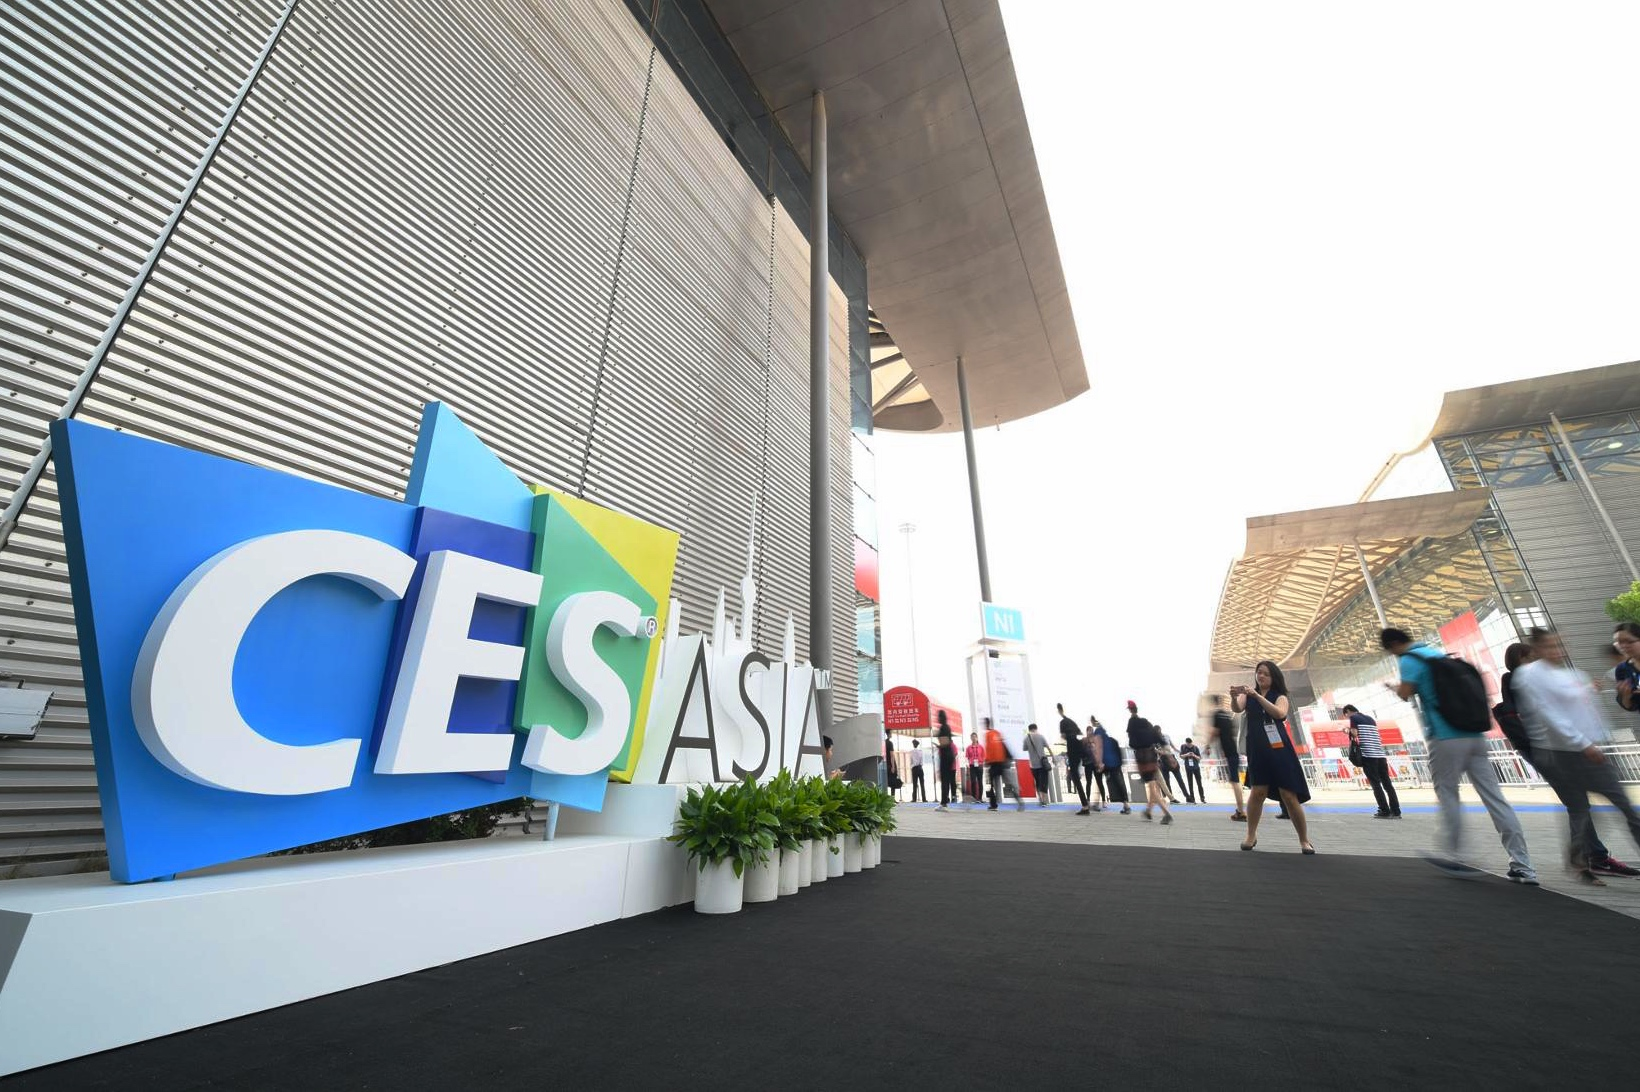 CES Asia